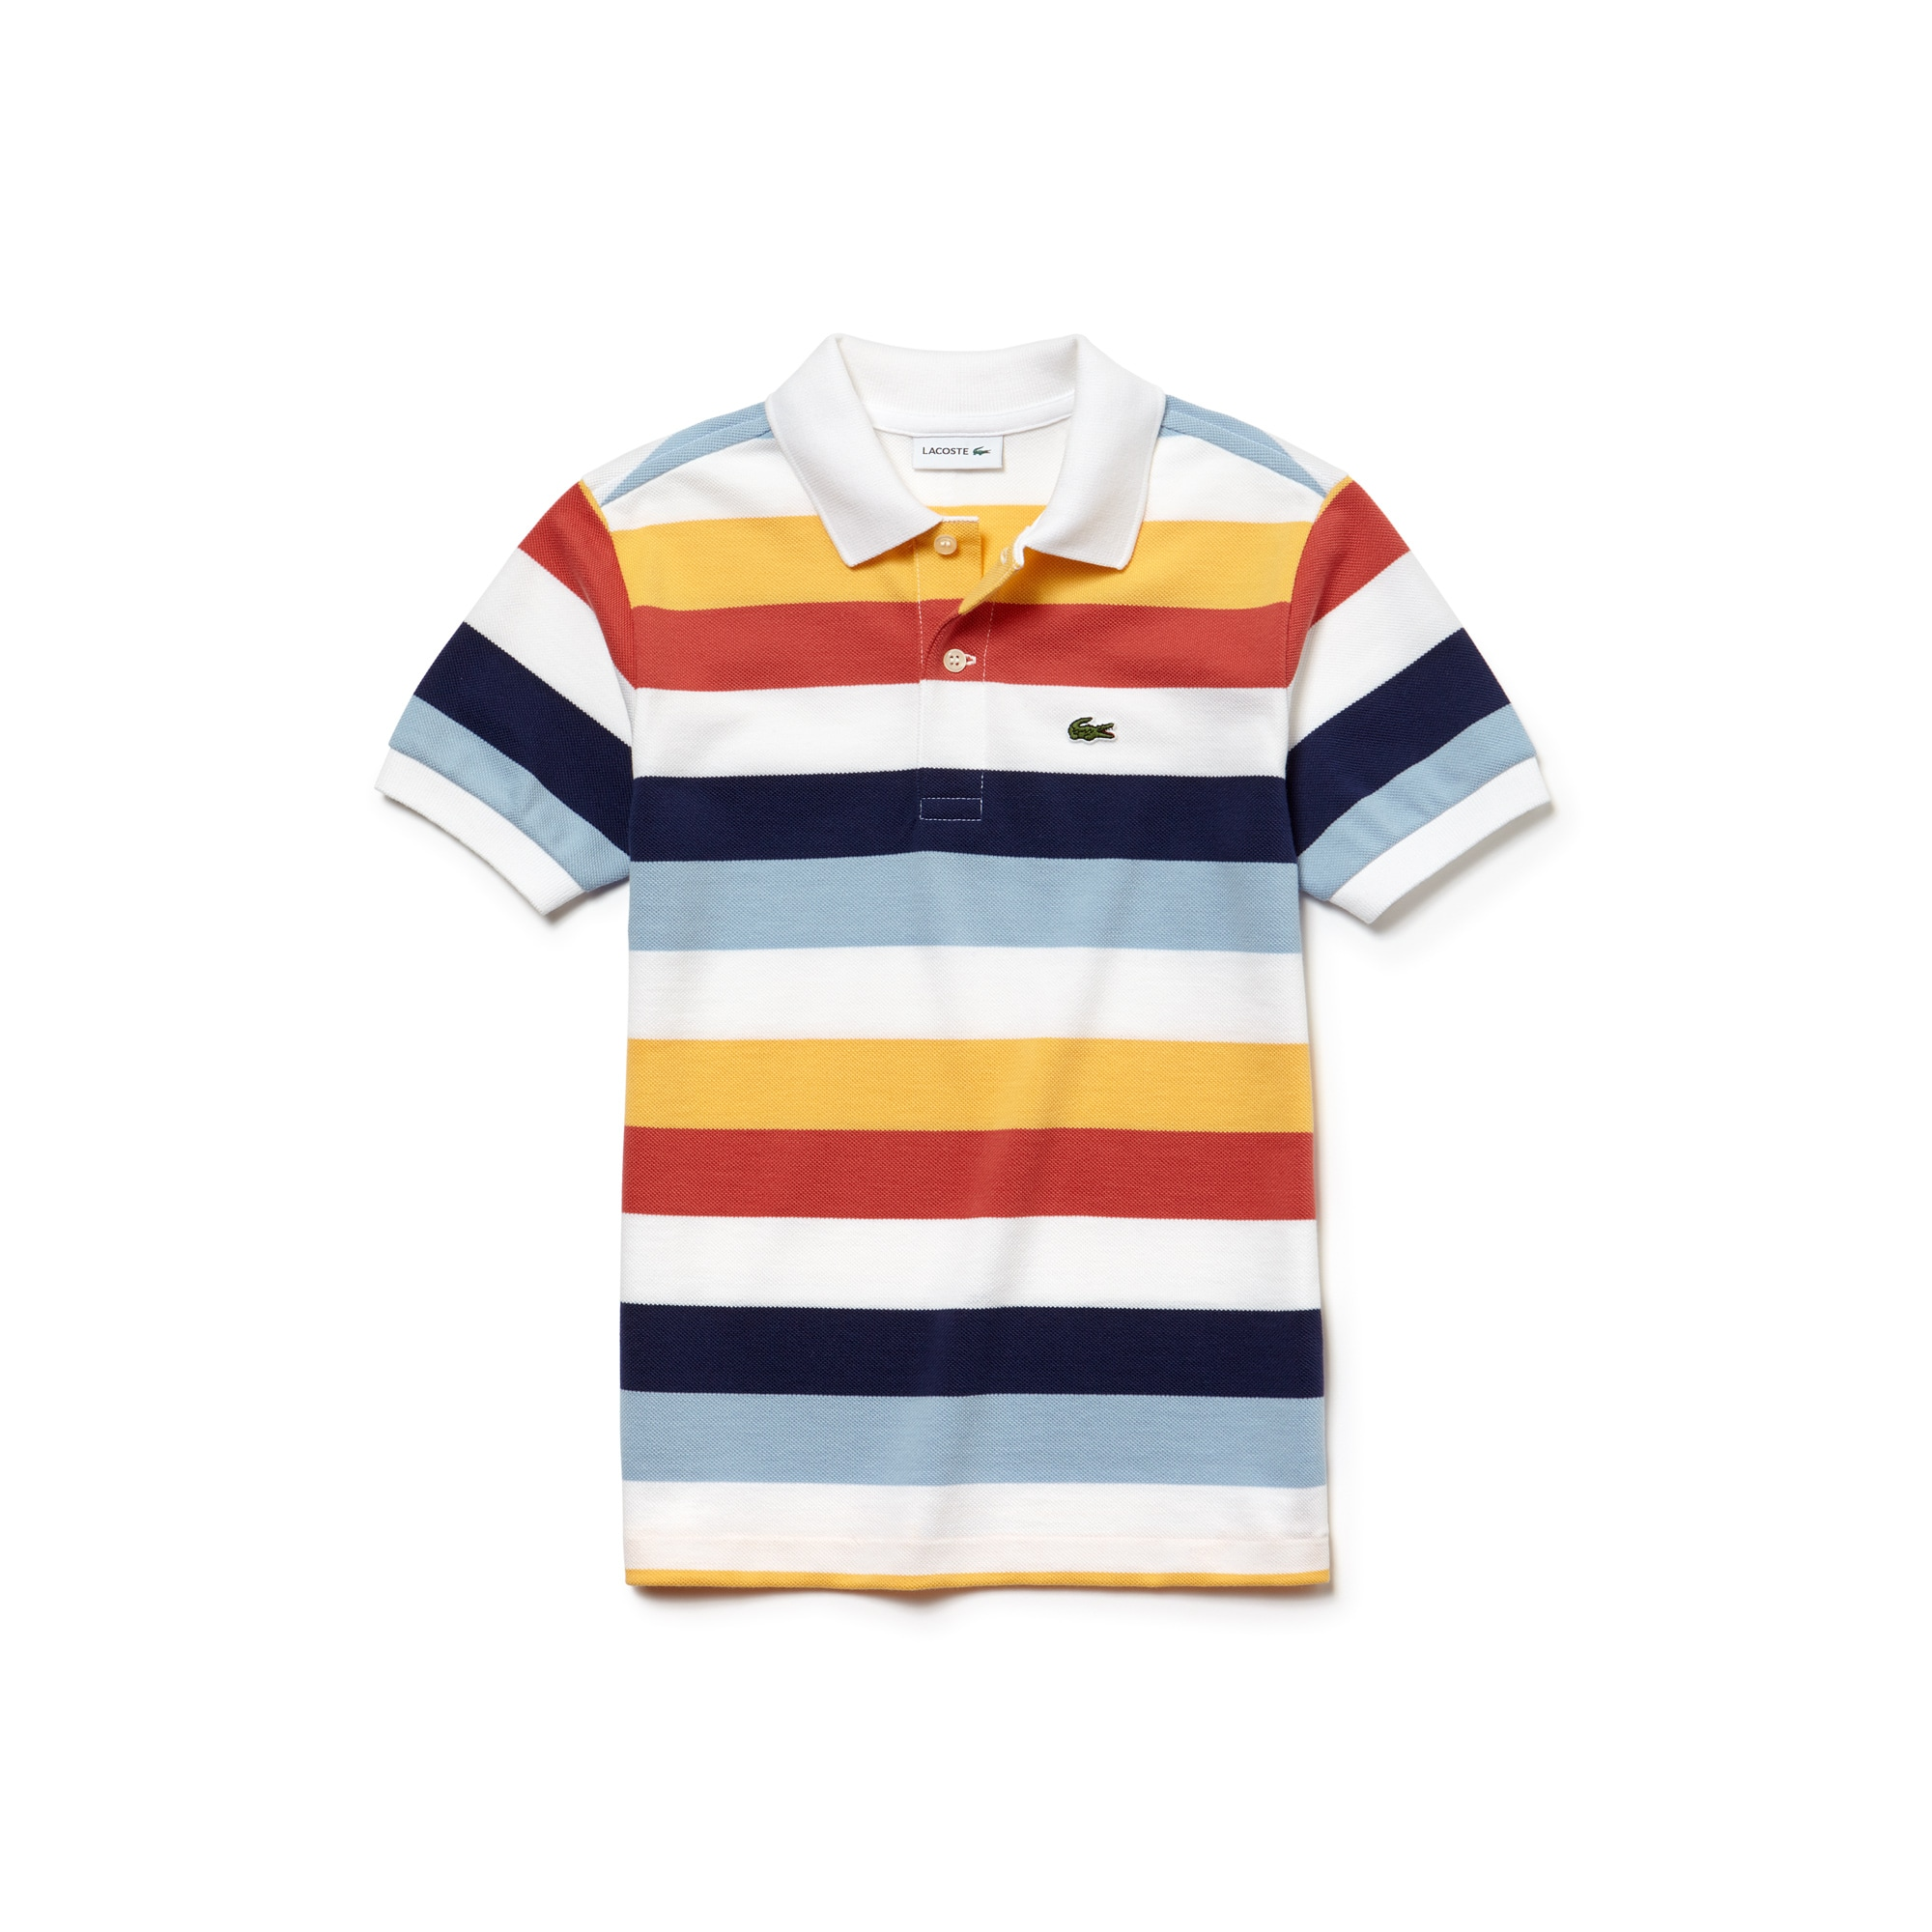 Polo Bambino Lacoste in piqué a righe colorate